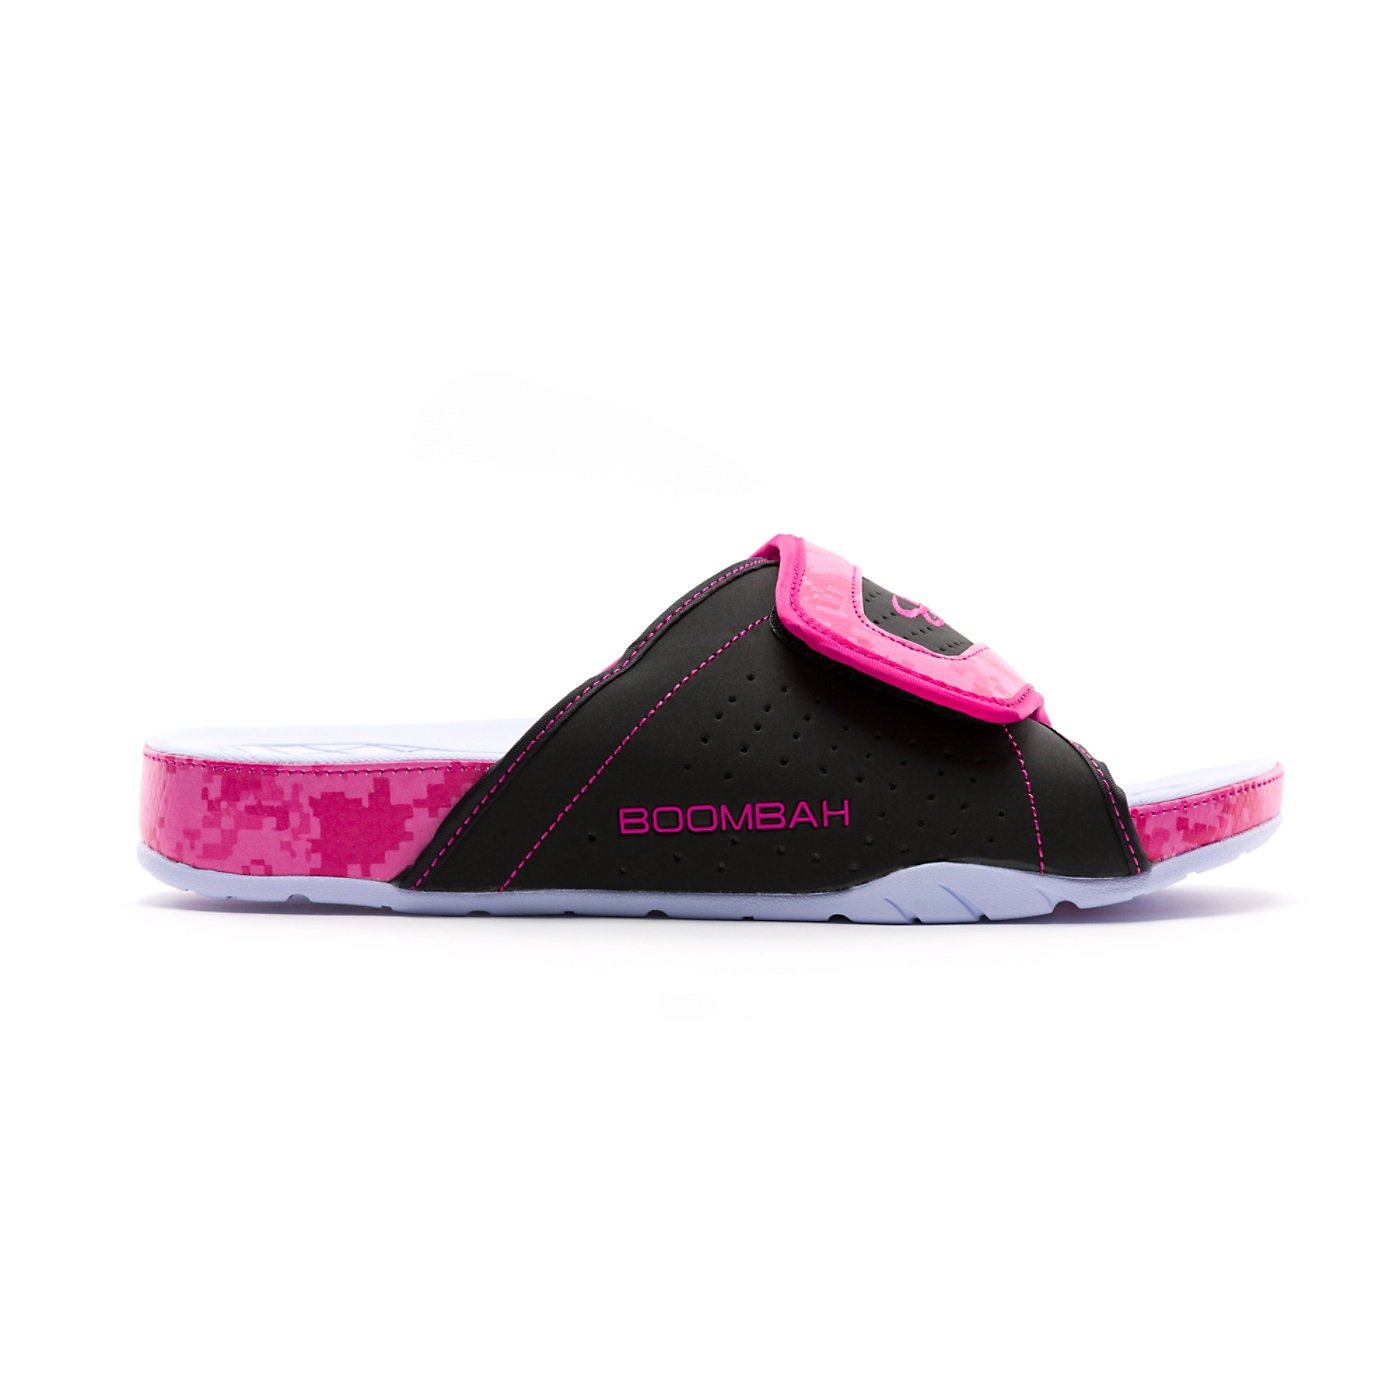 Boombah Men's Tyrant Slide Sandals - 32 Color Options - Multiple Sizes B07CT5Y3FQ 9|Black/Pink/White